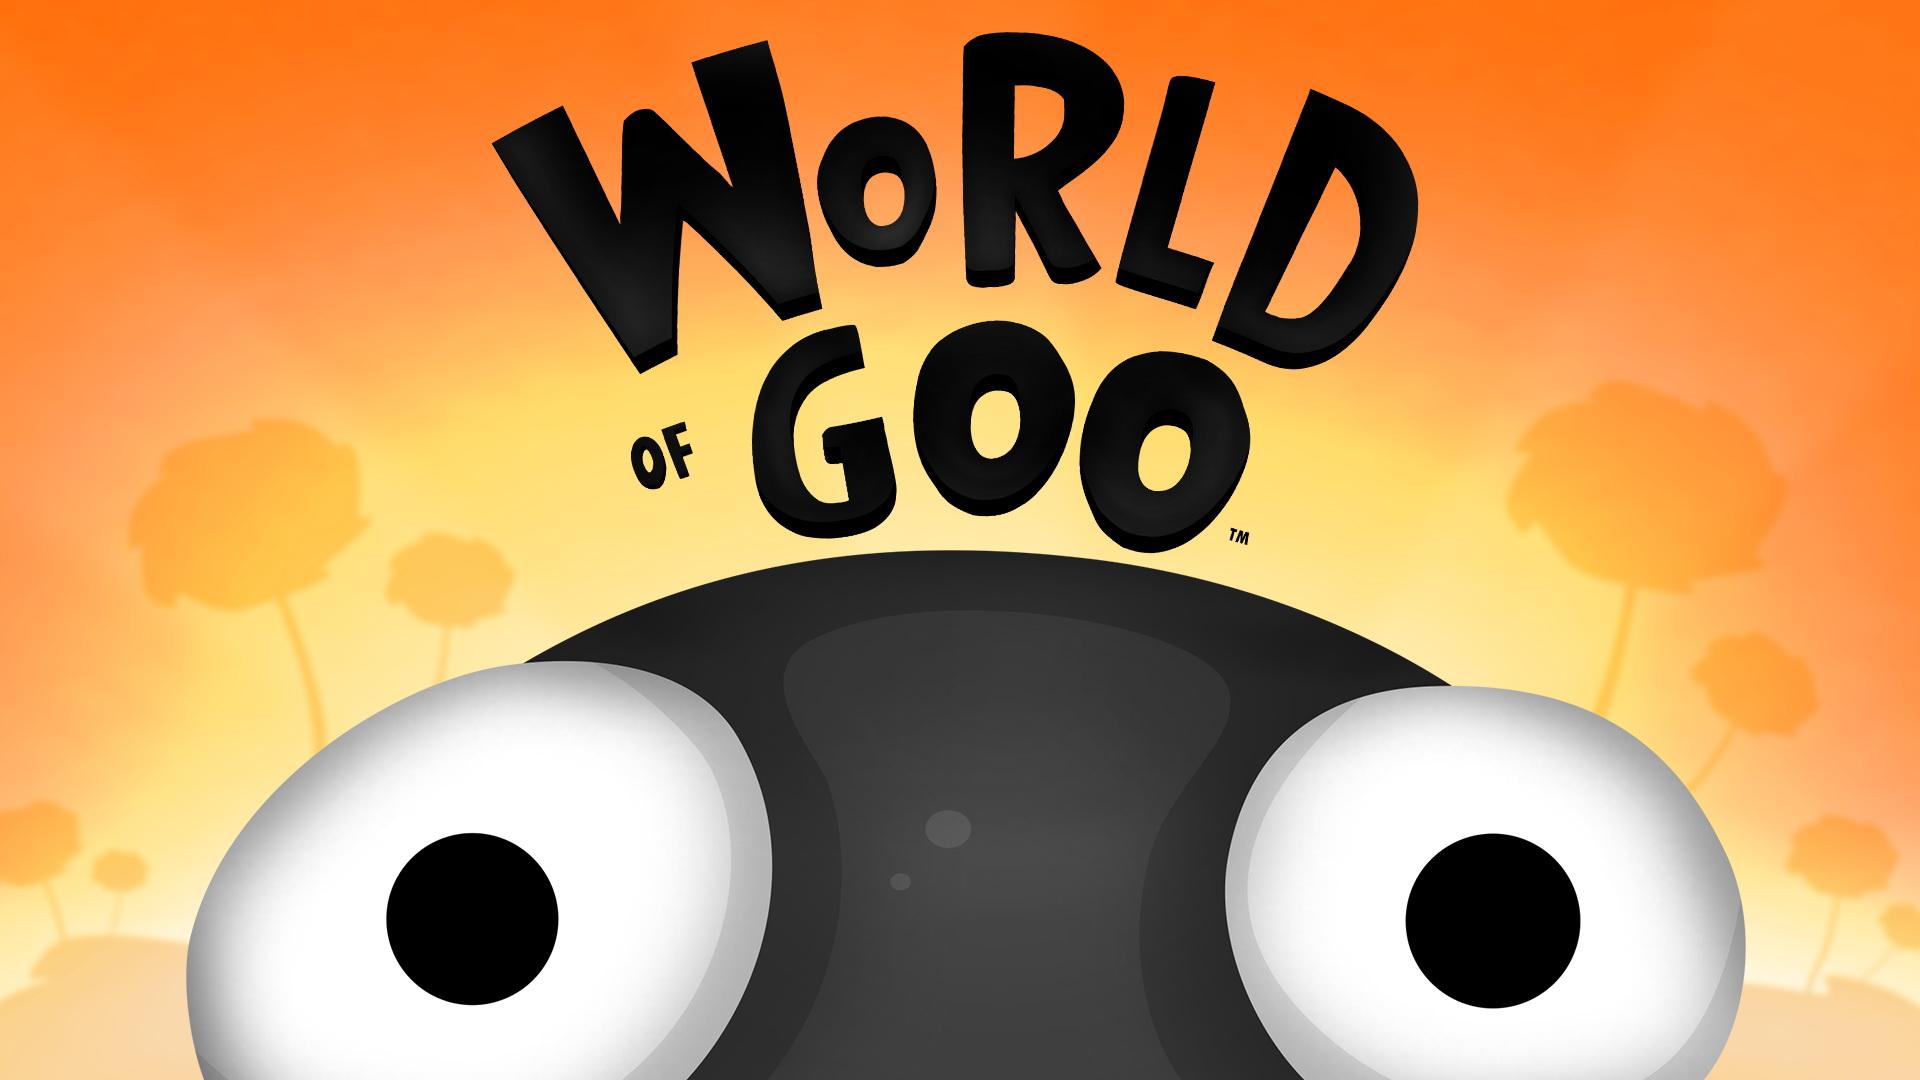 permainan seru world of goo